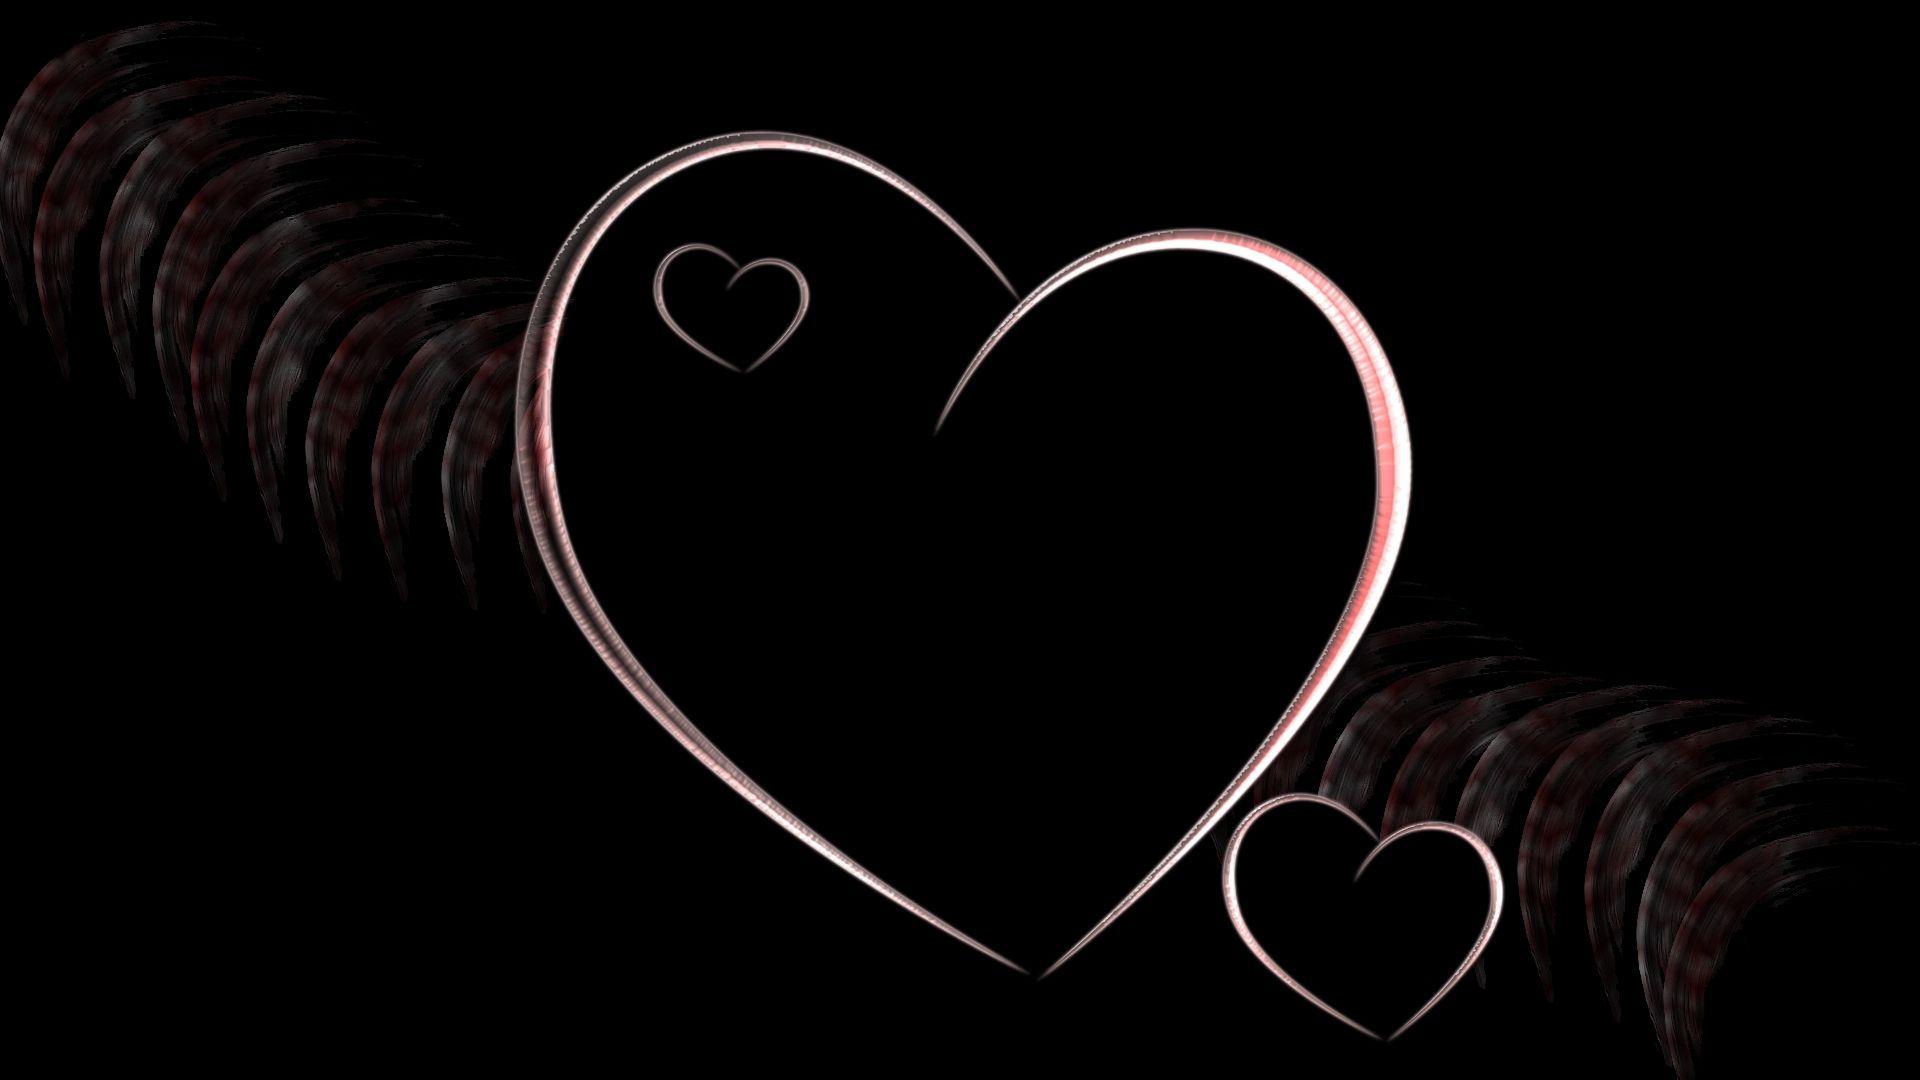 Heart Patterns Smoke Black Background 56935 1920x1080 Jpg 1920 1080 Black Background Wallpaper Black Backgrounds Black Love Heart